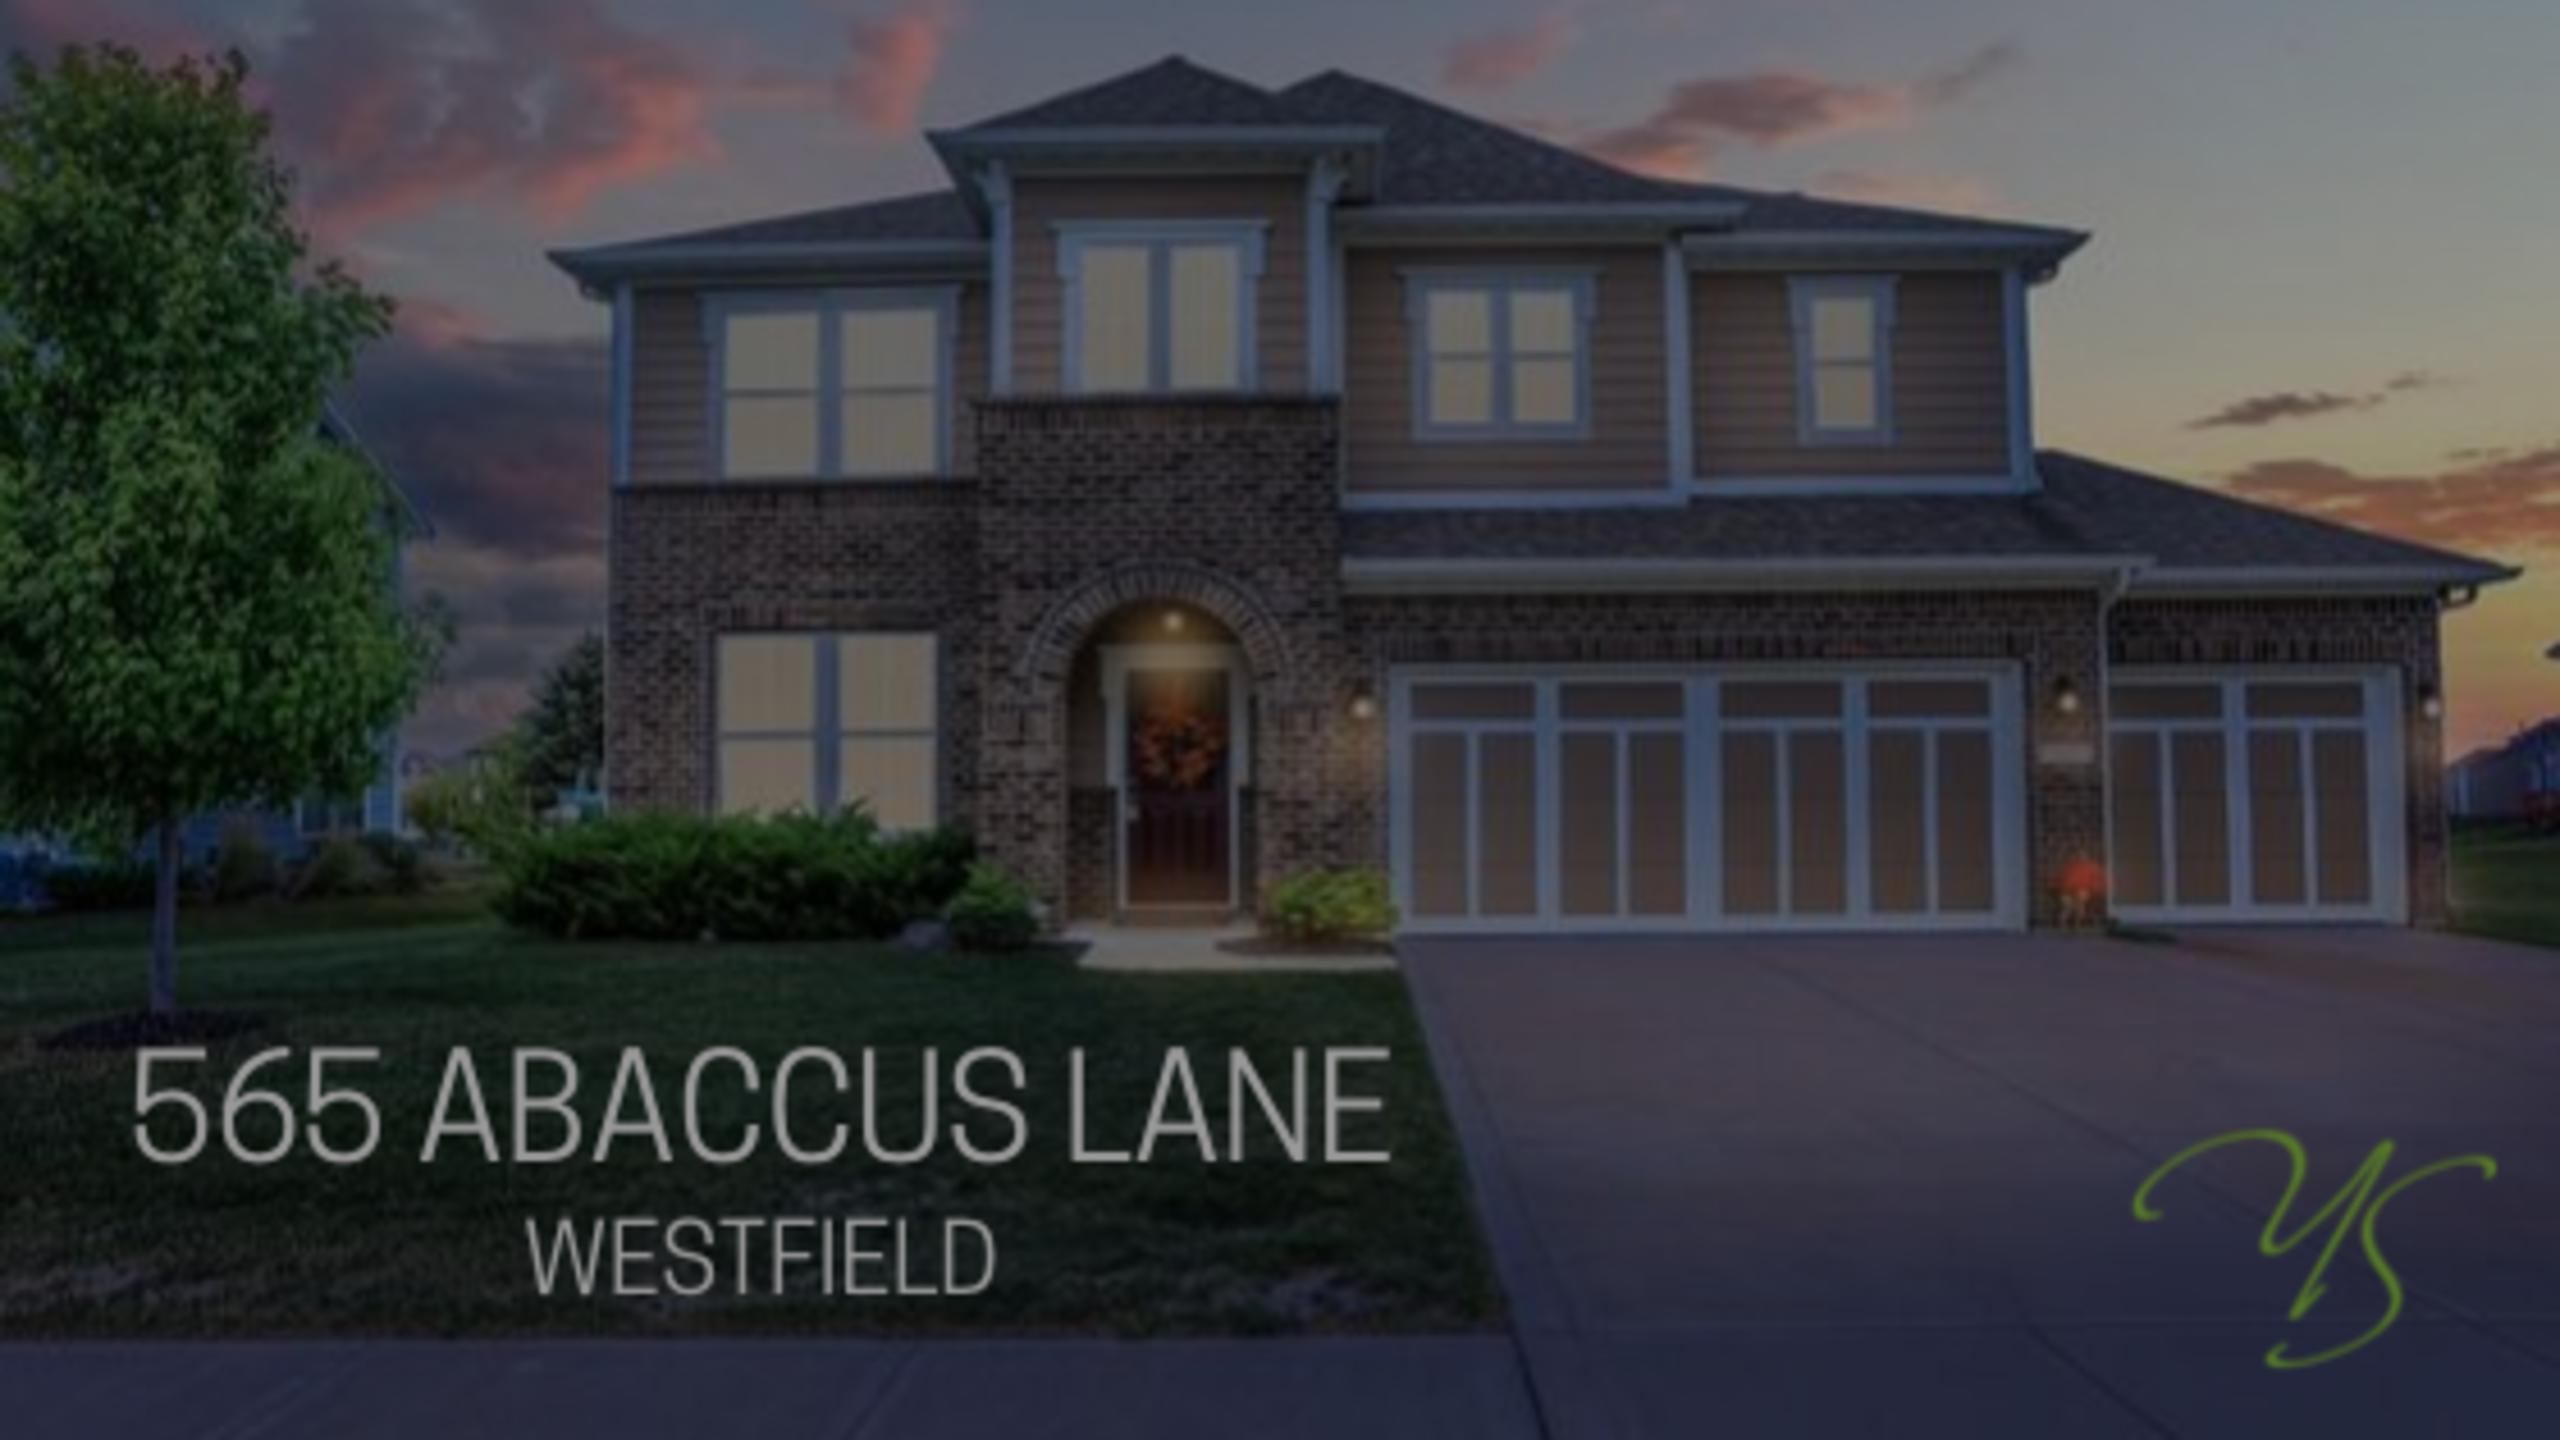 565 Abaccus Lane